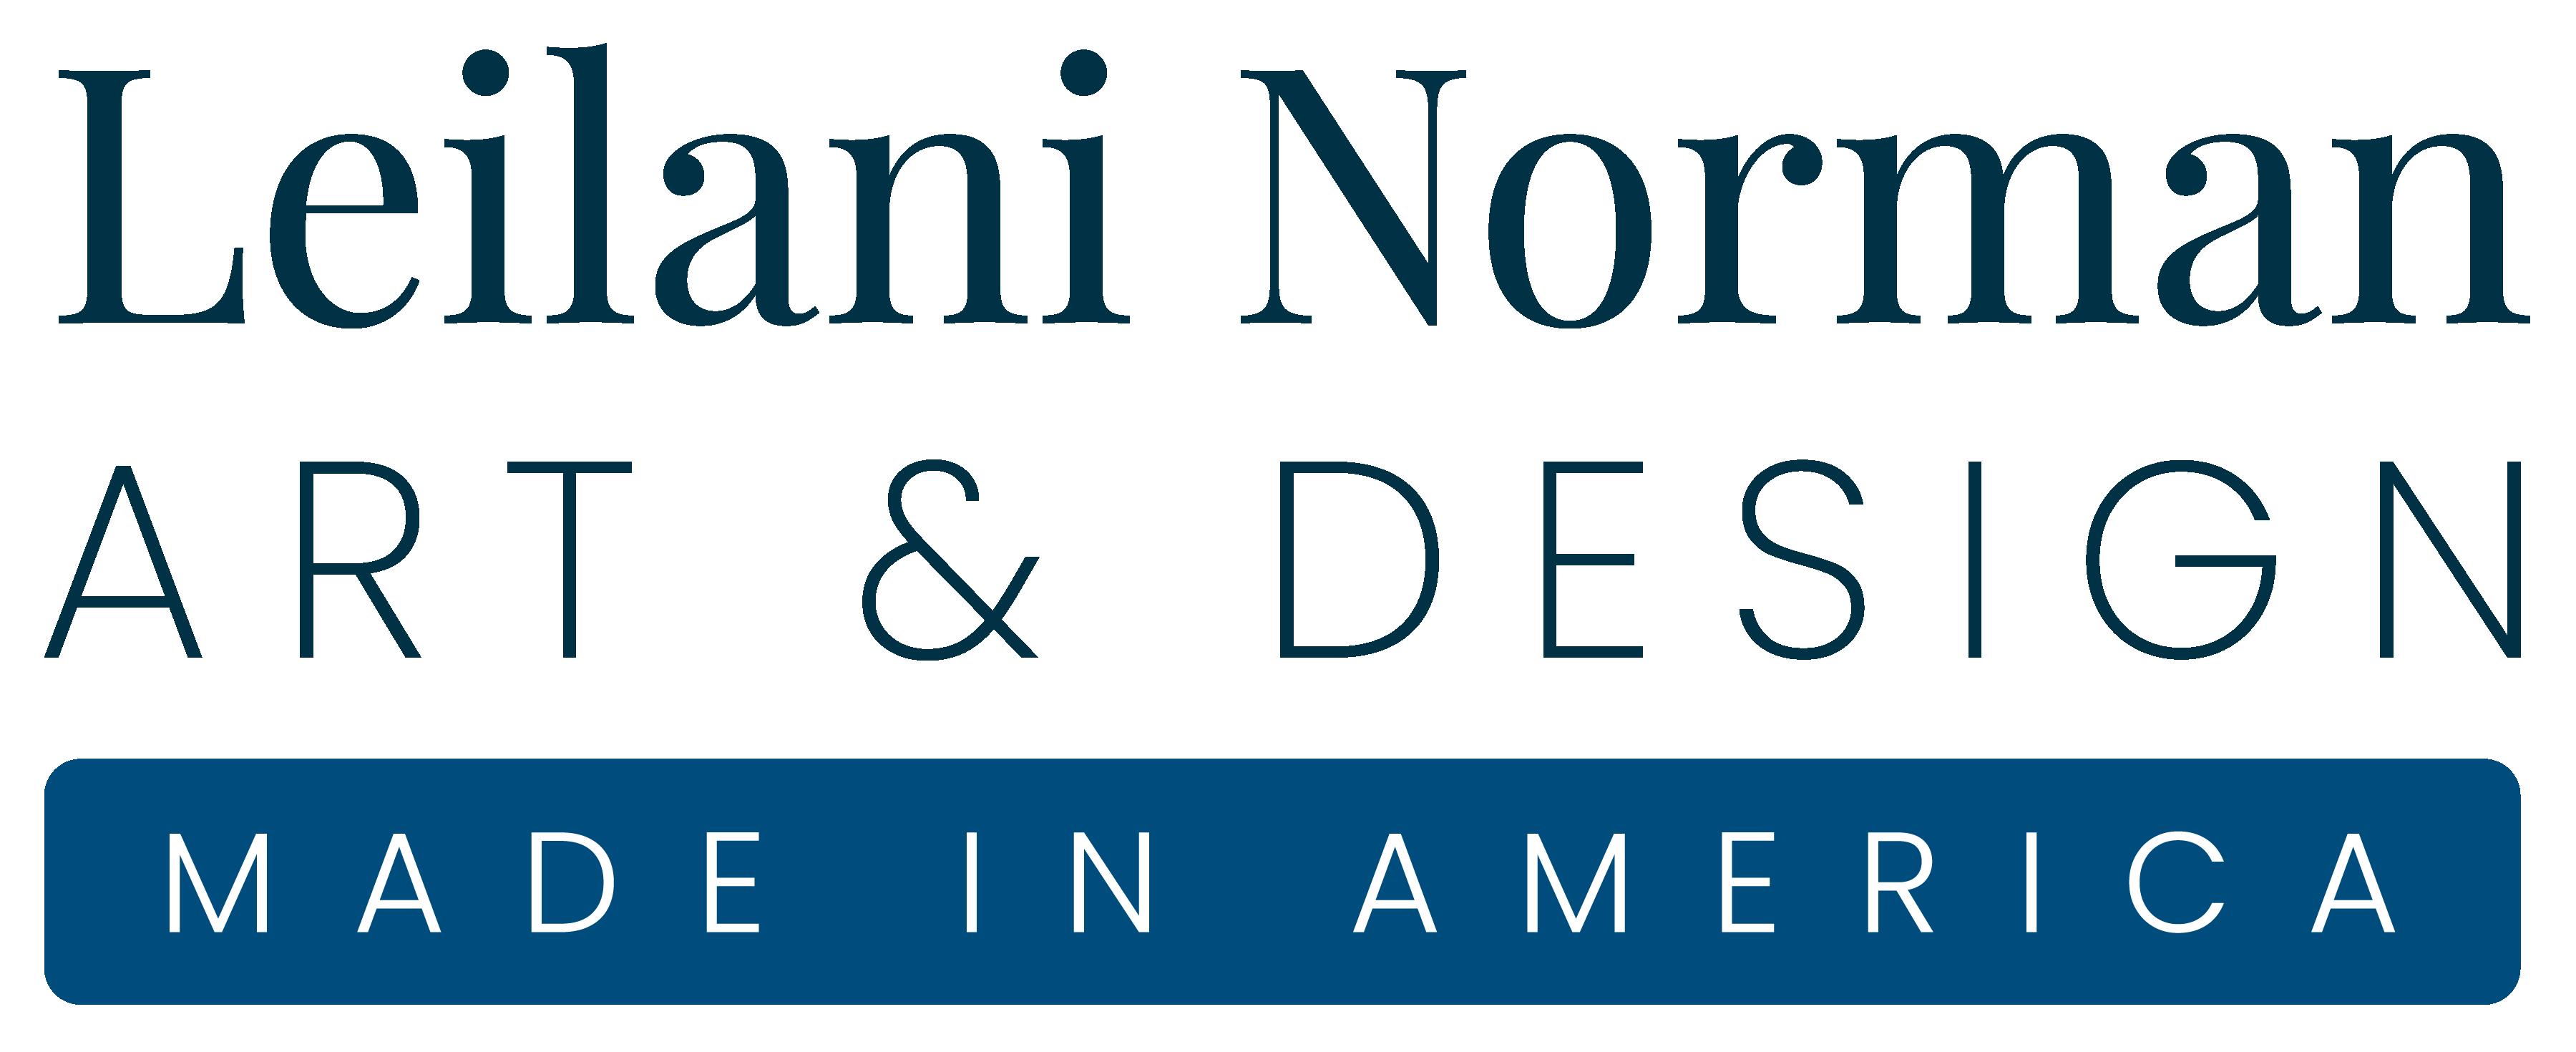 Leilani Norman Art & Design | Made in America